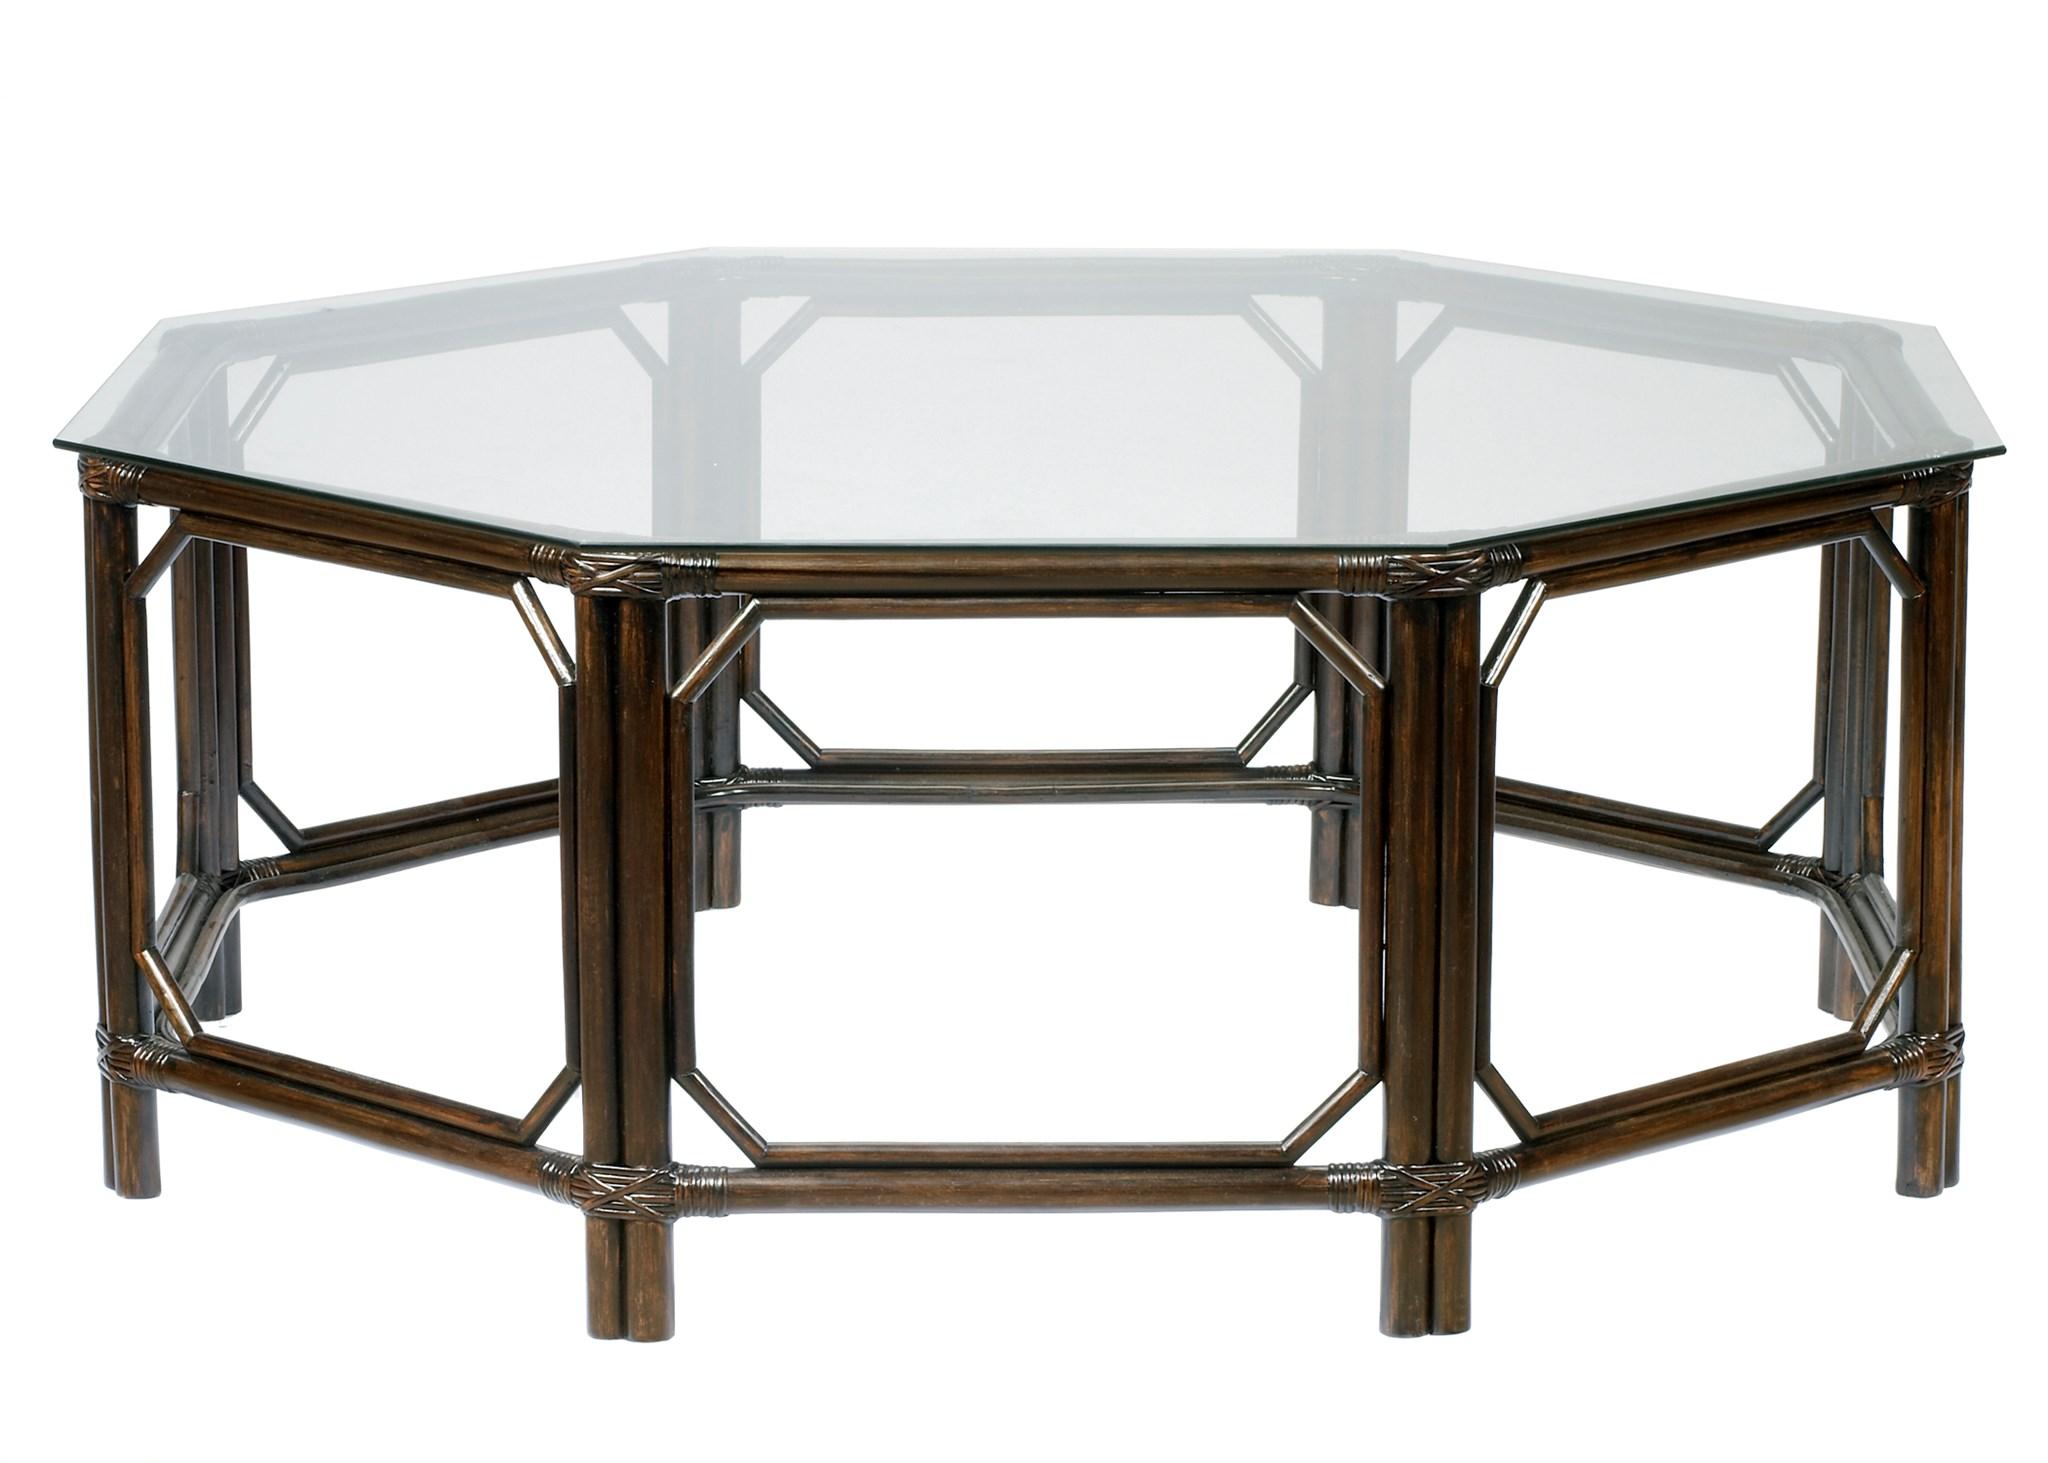 Regeant Octagon Coffee Table W/Glass   Clove